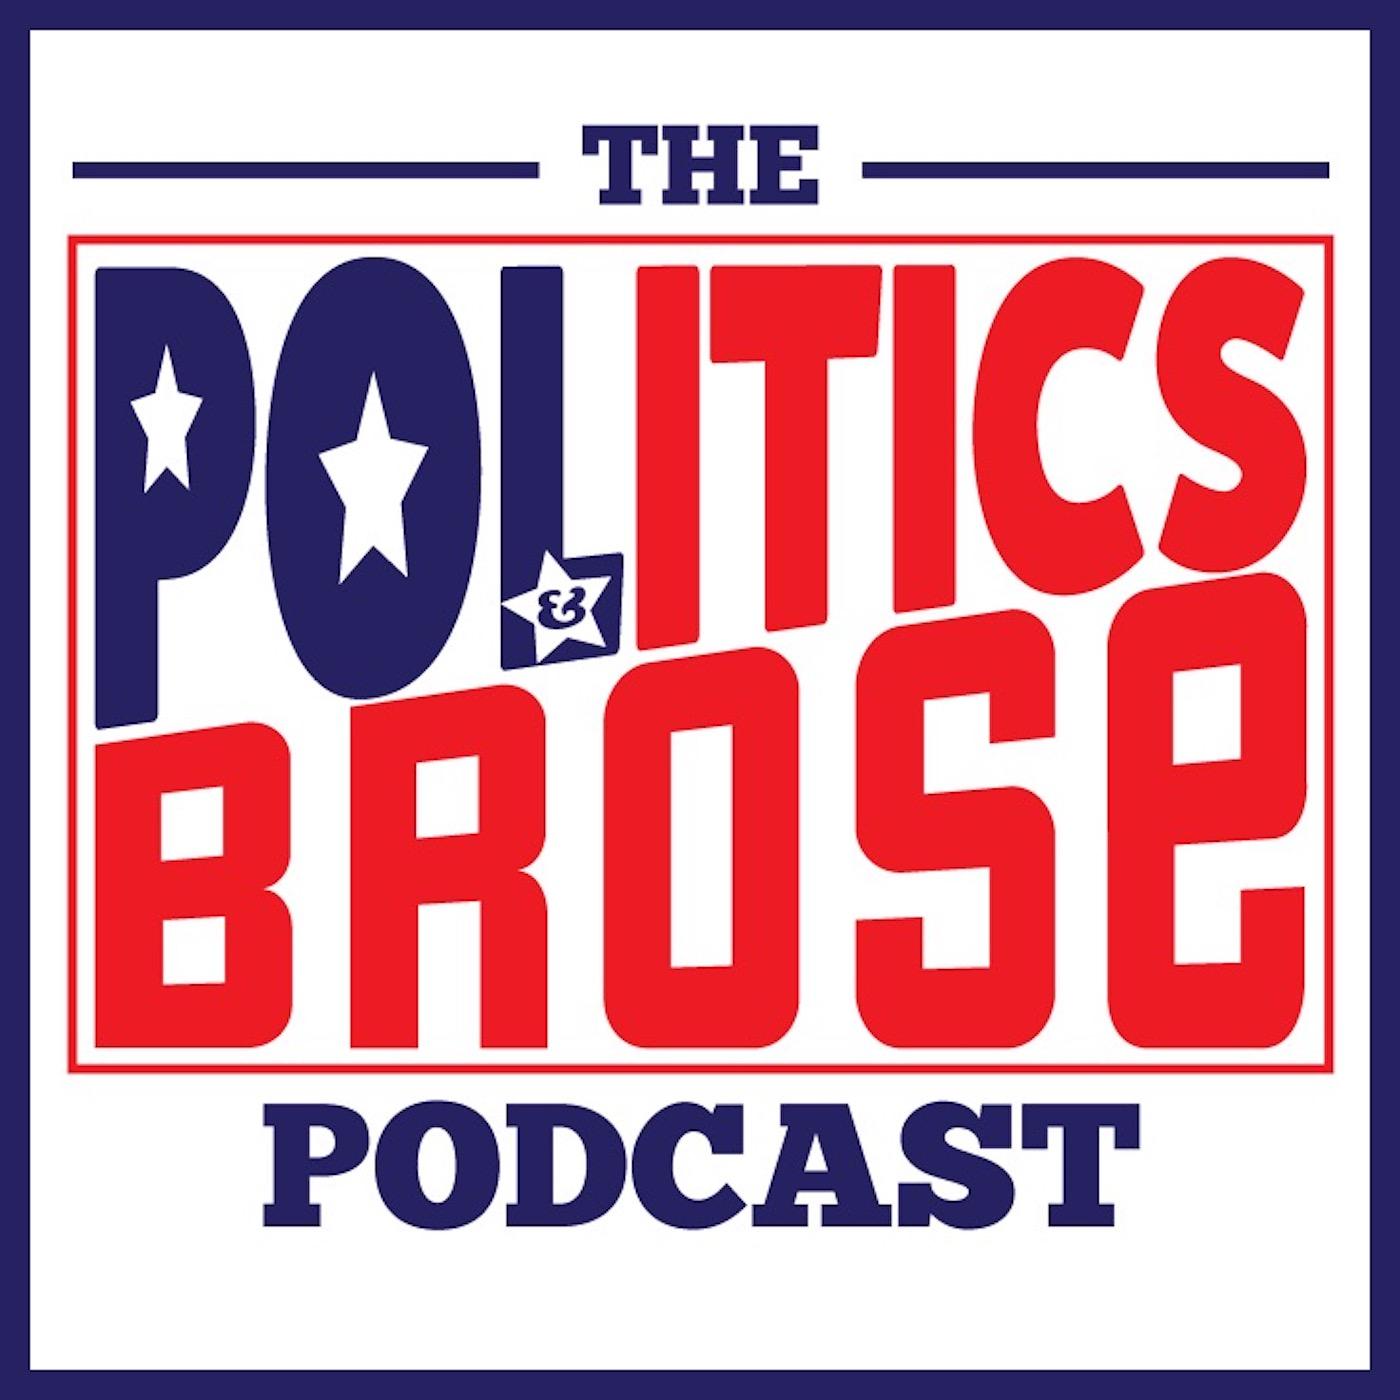 Politics & Brose